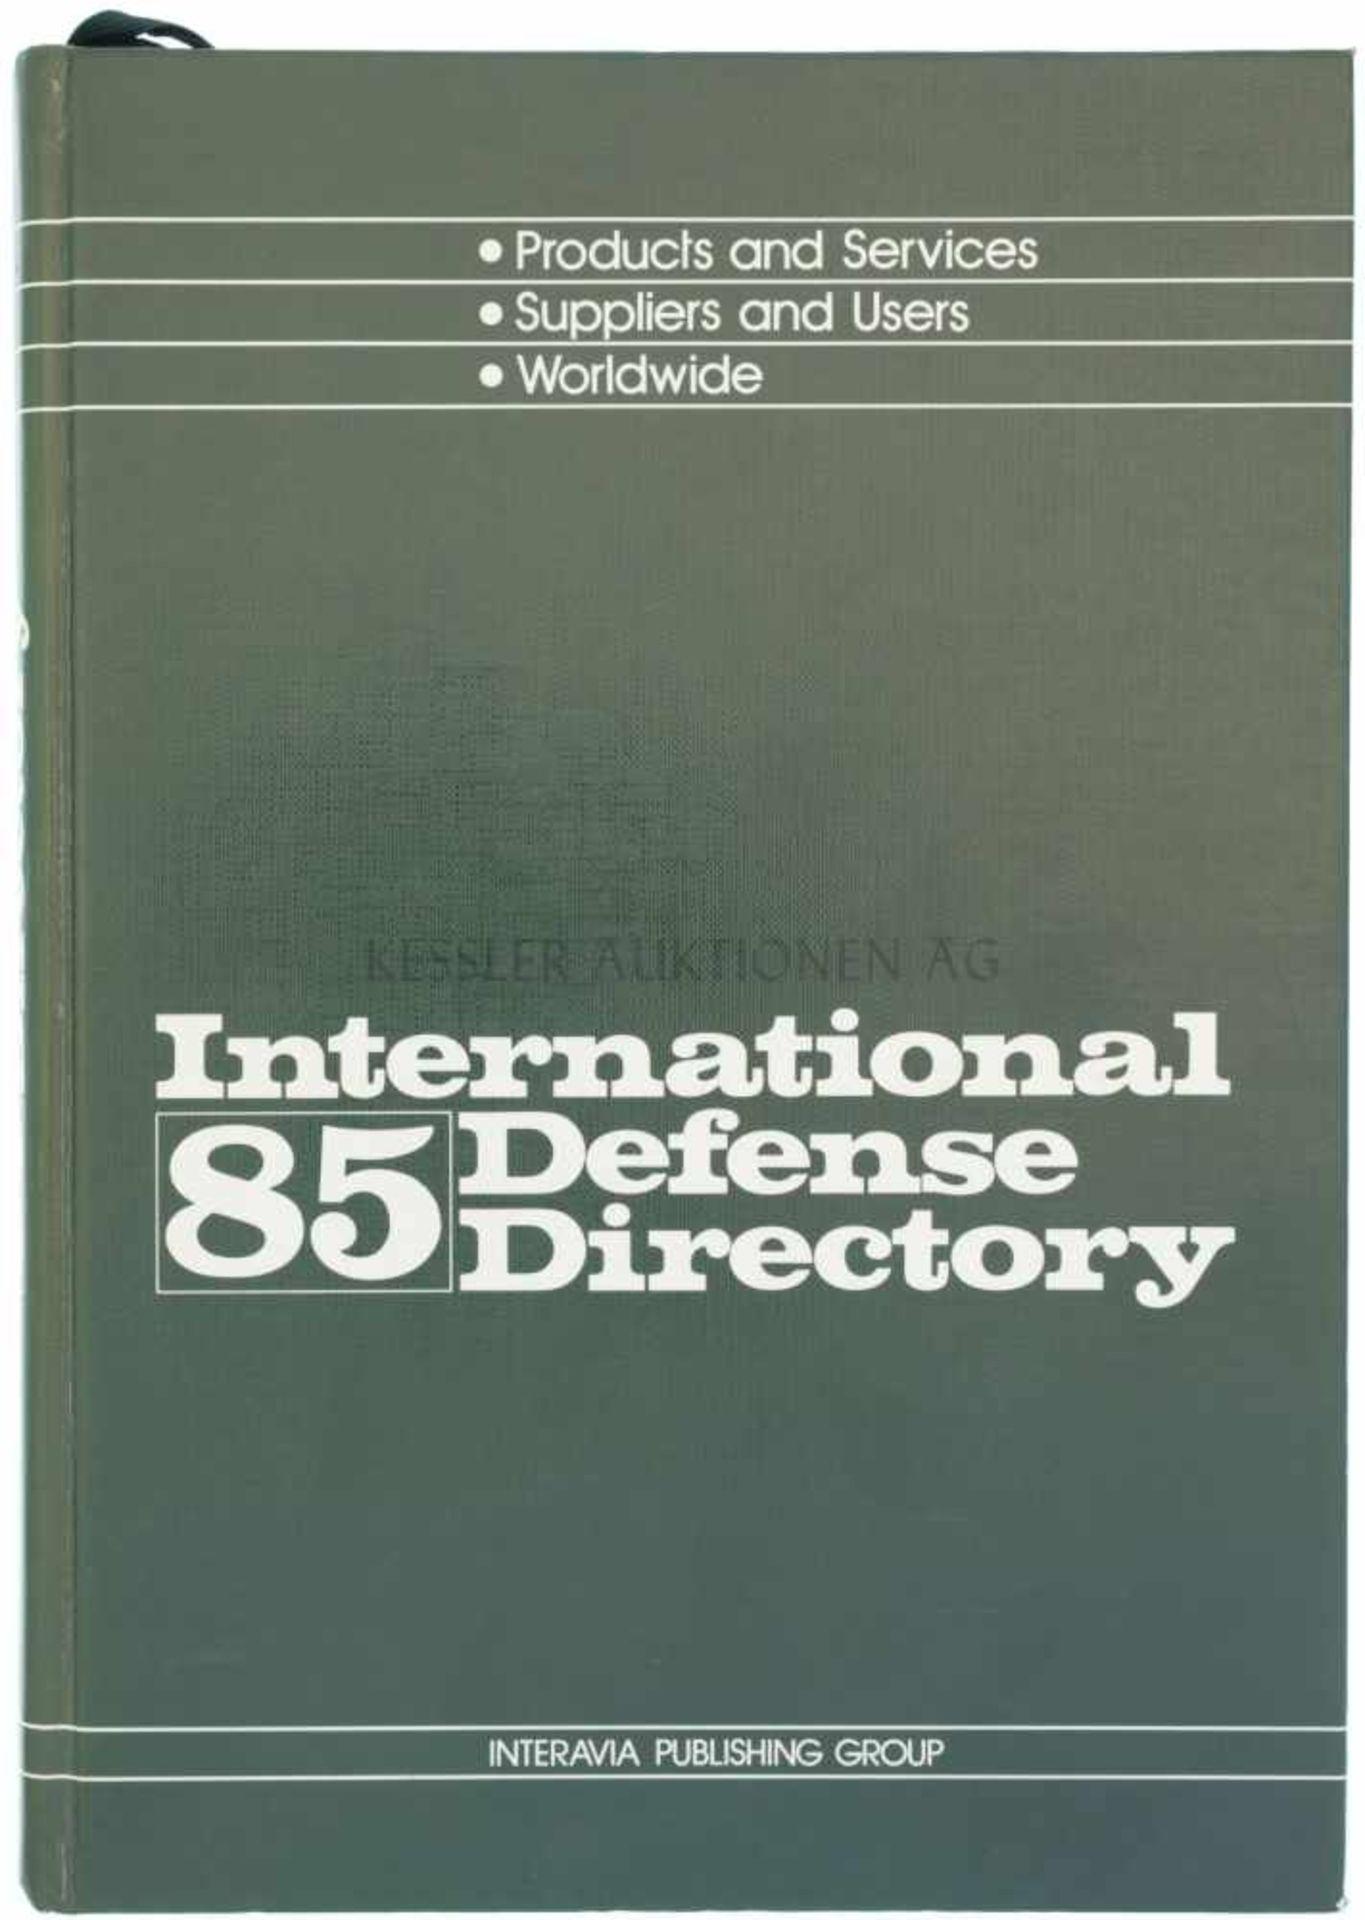 International Defense Directory 85 Autor C.E. Howard, 1984, 701 Seiten, Interavia Publishing